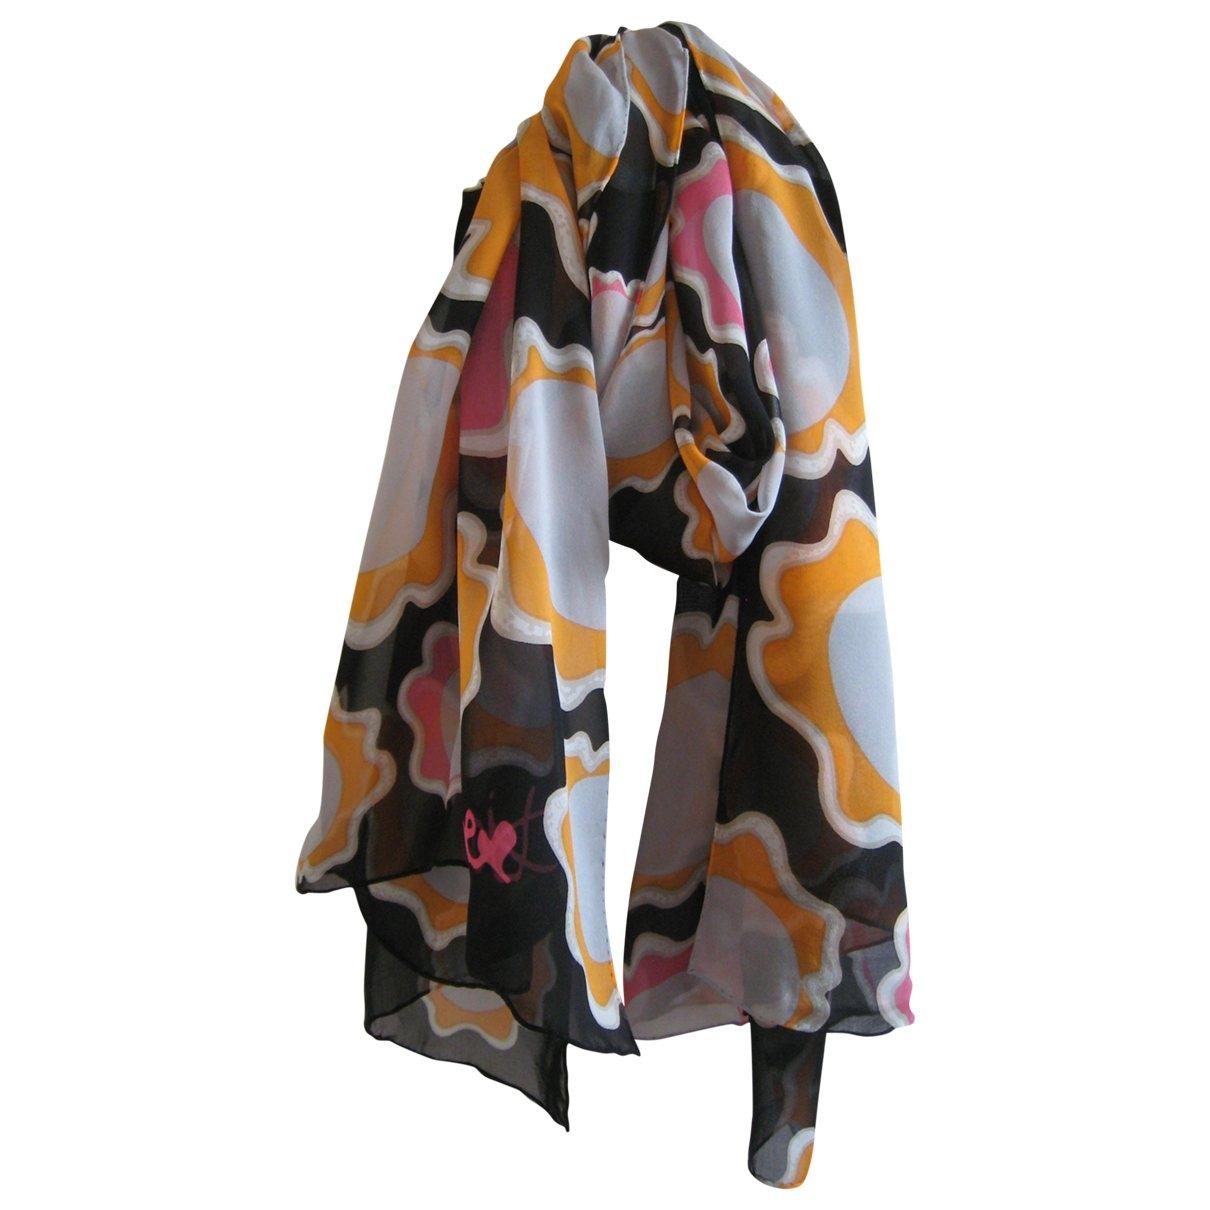 Diane Von Furstenberg - Foulard   pour femme en soie - multicolore